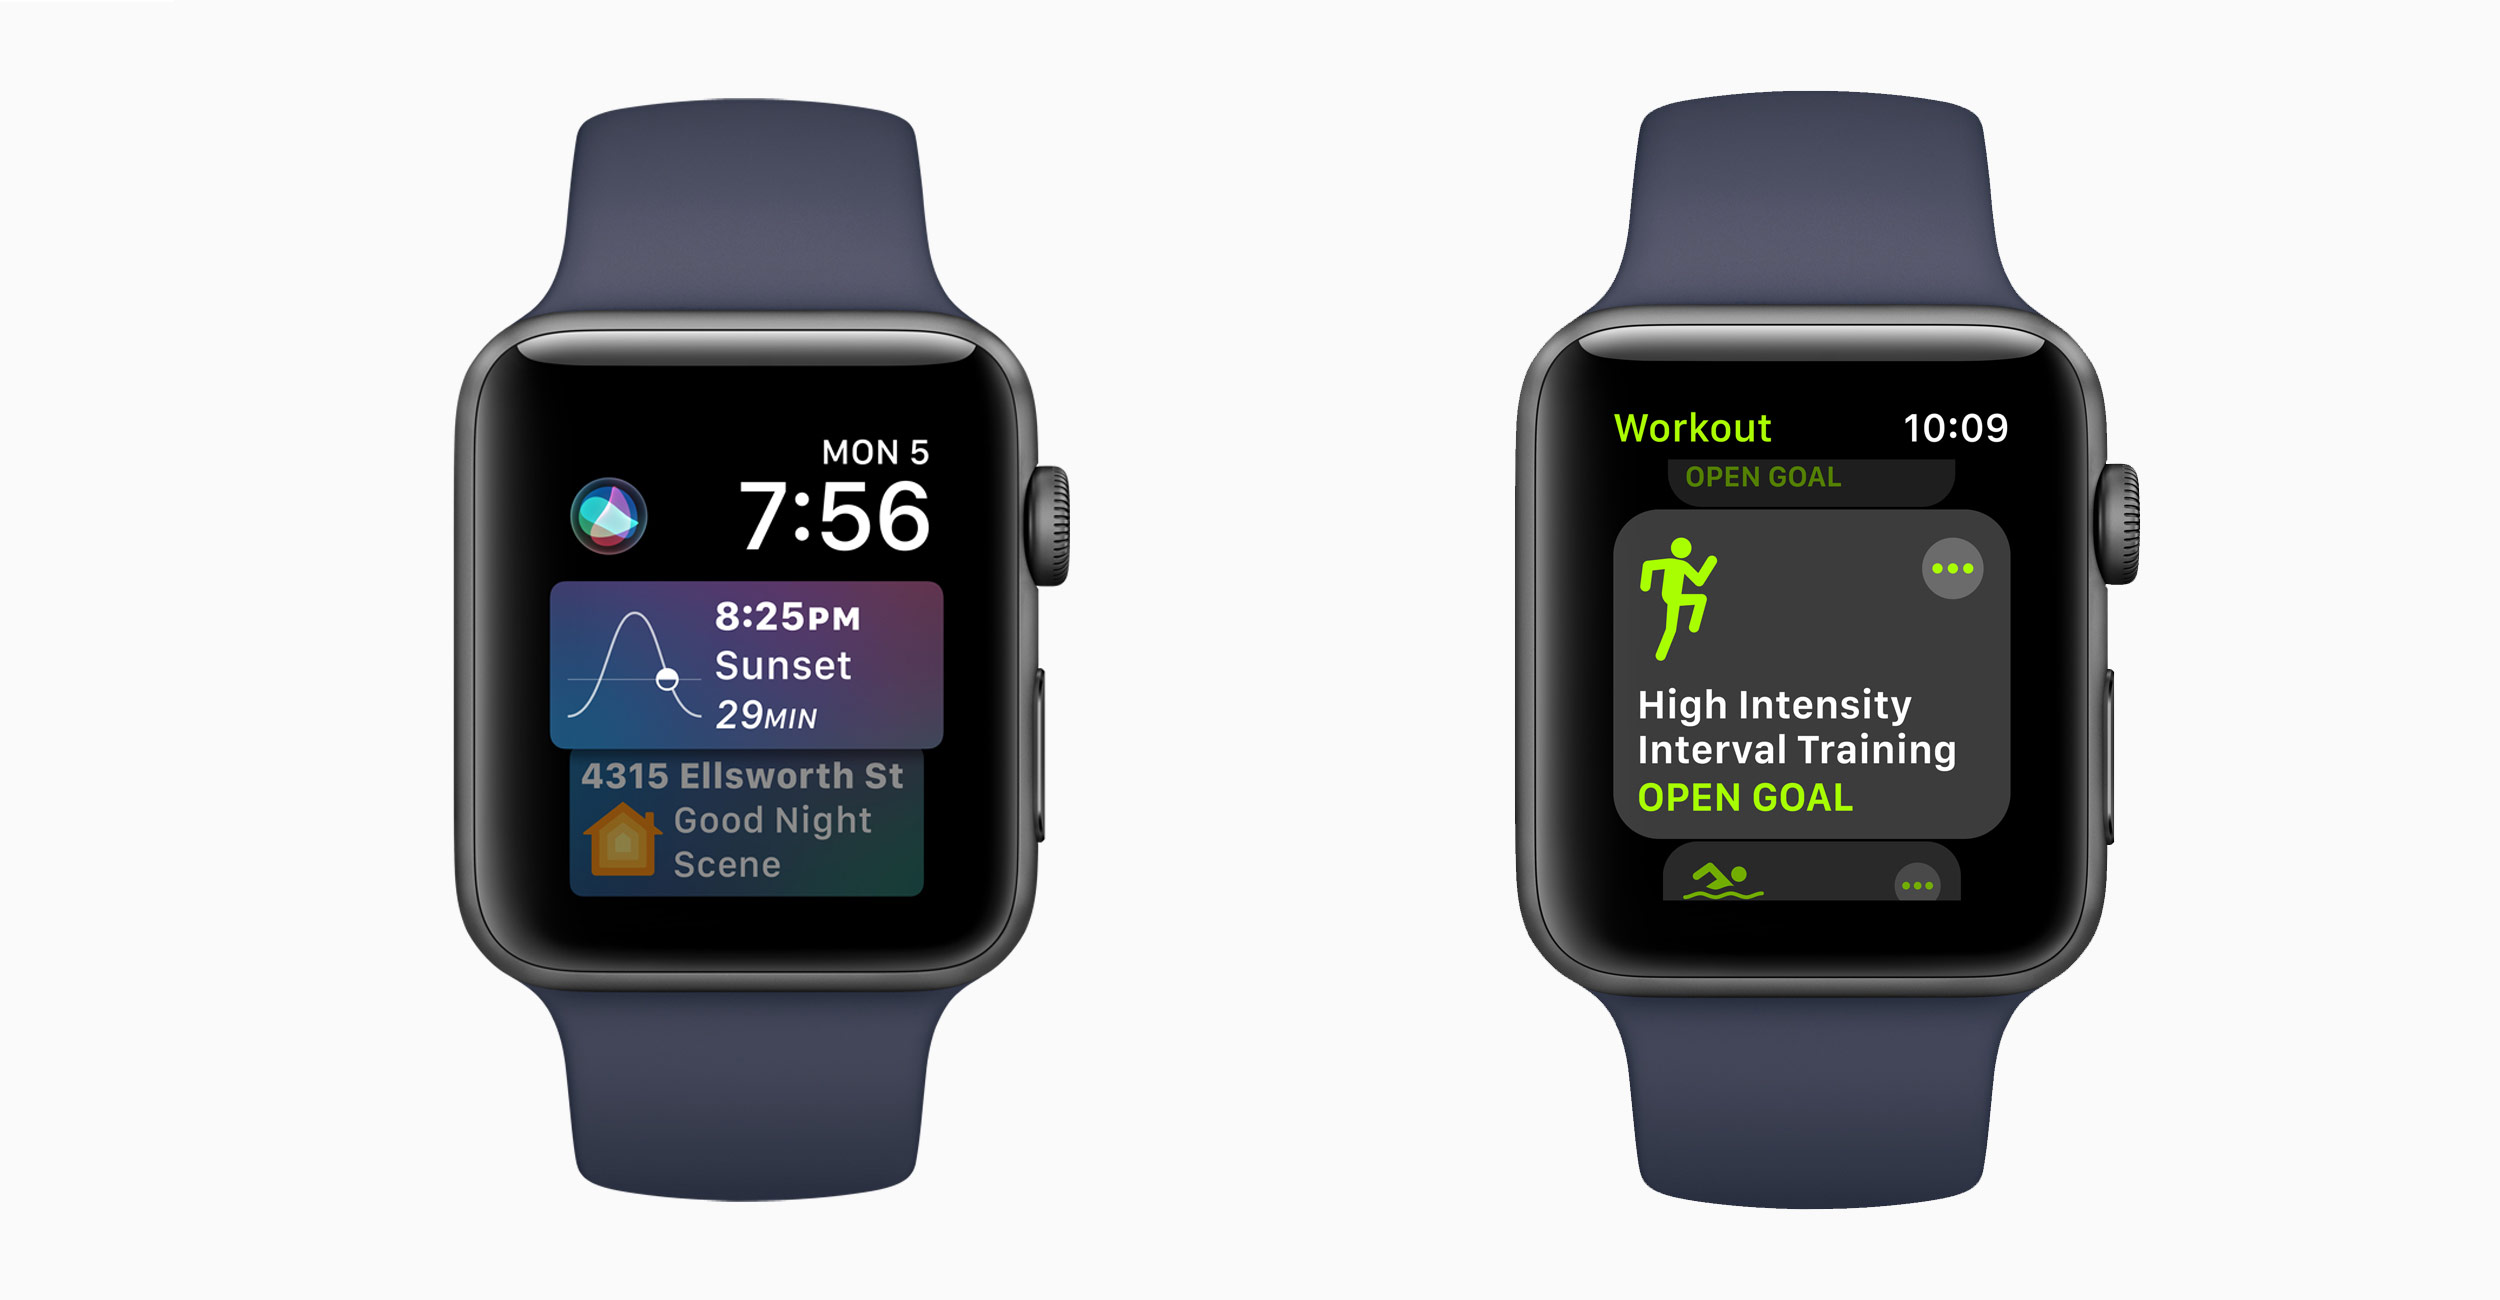 Apple Seeds Sixth Beta Version of watchOS 4, tvOS 11 to Developers